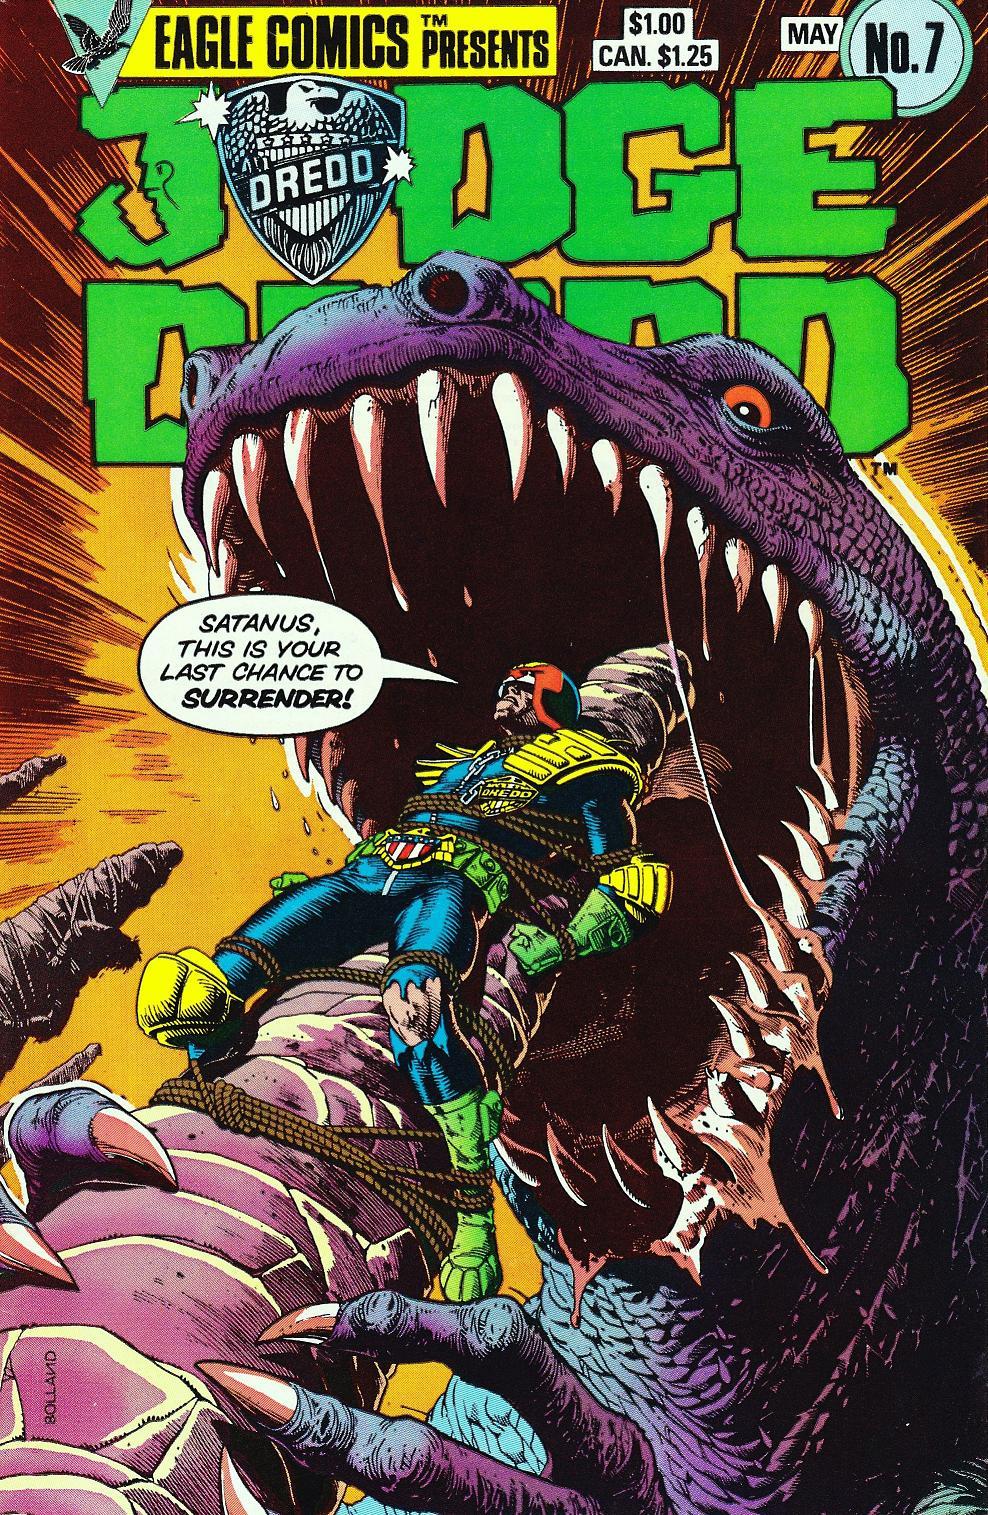 The Secret Stories >> Judge Dredd versus Satanus, the Black Tyrannosaur! | Mars Will Send No More